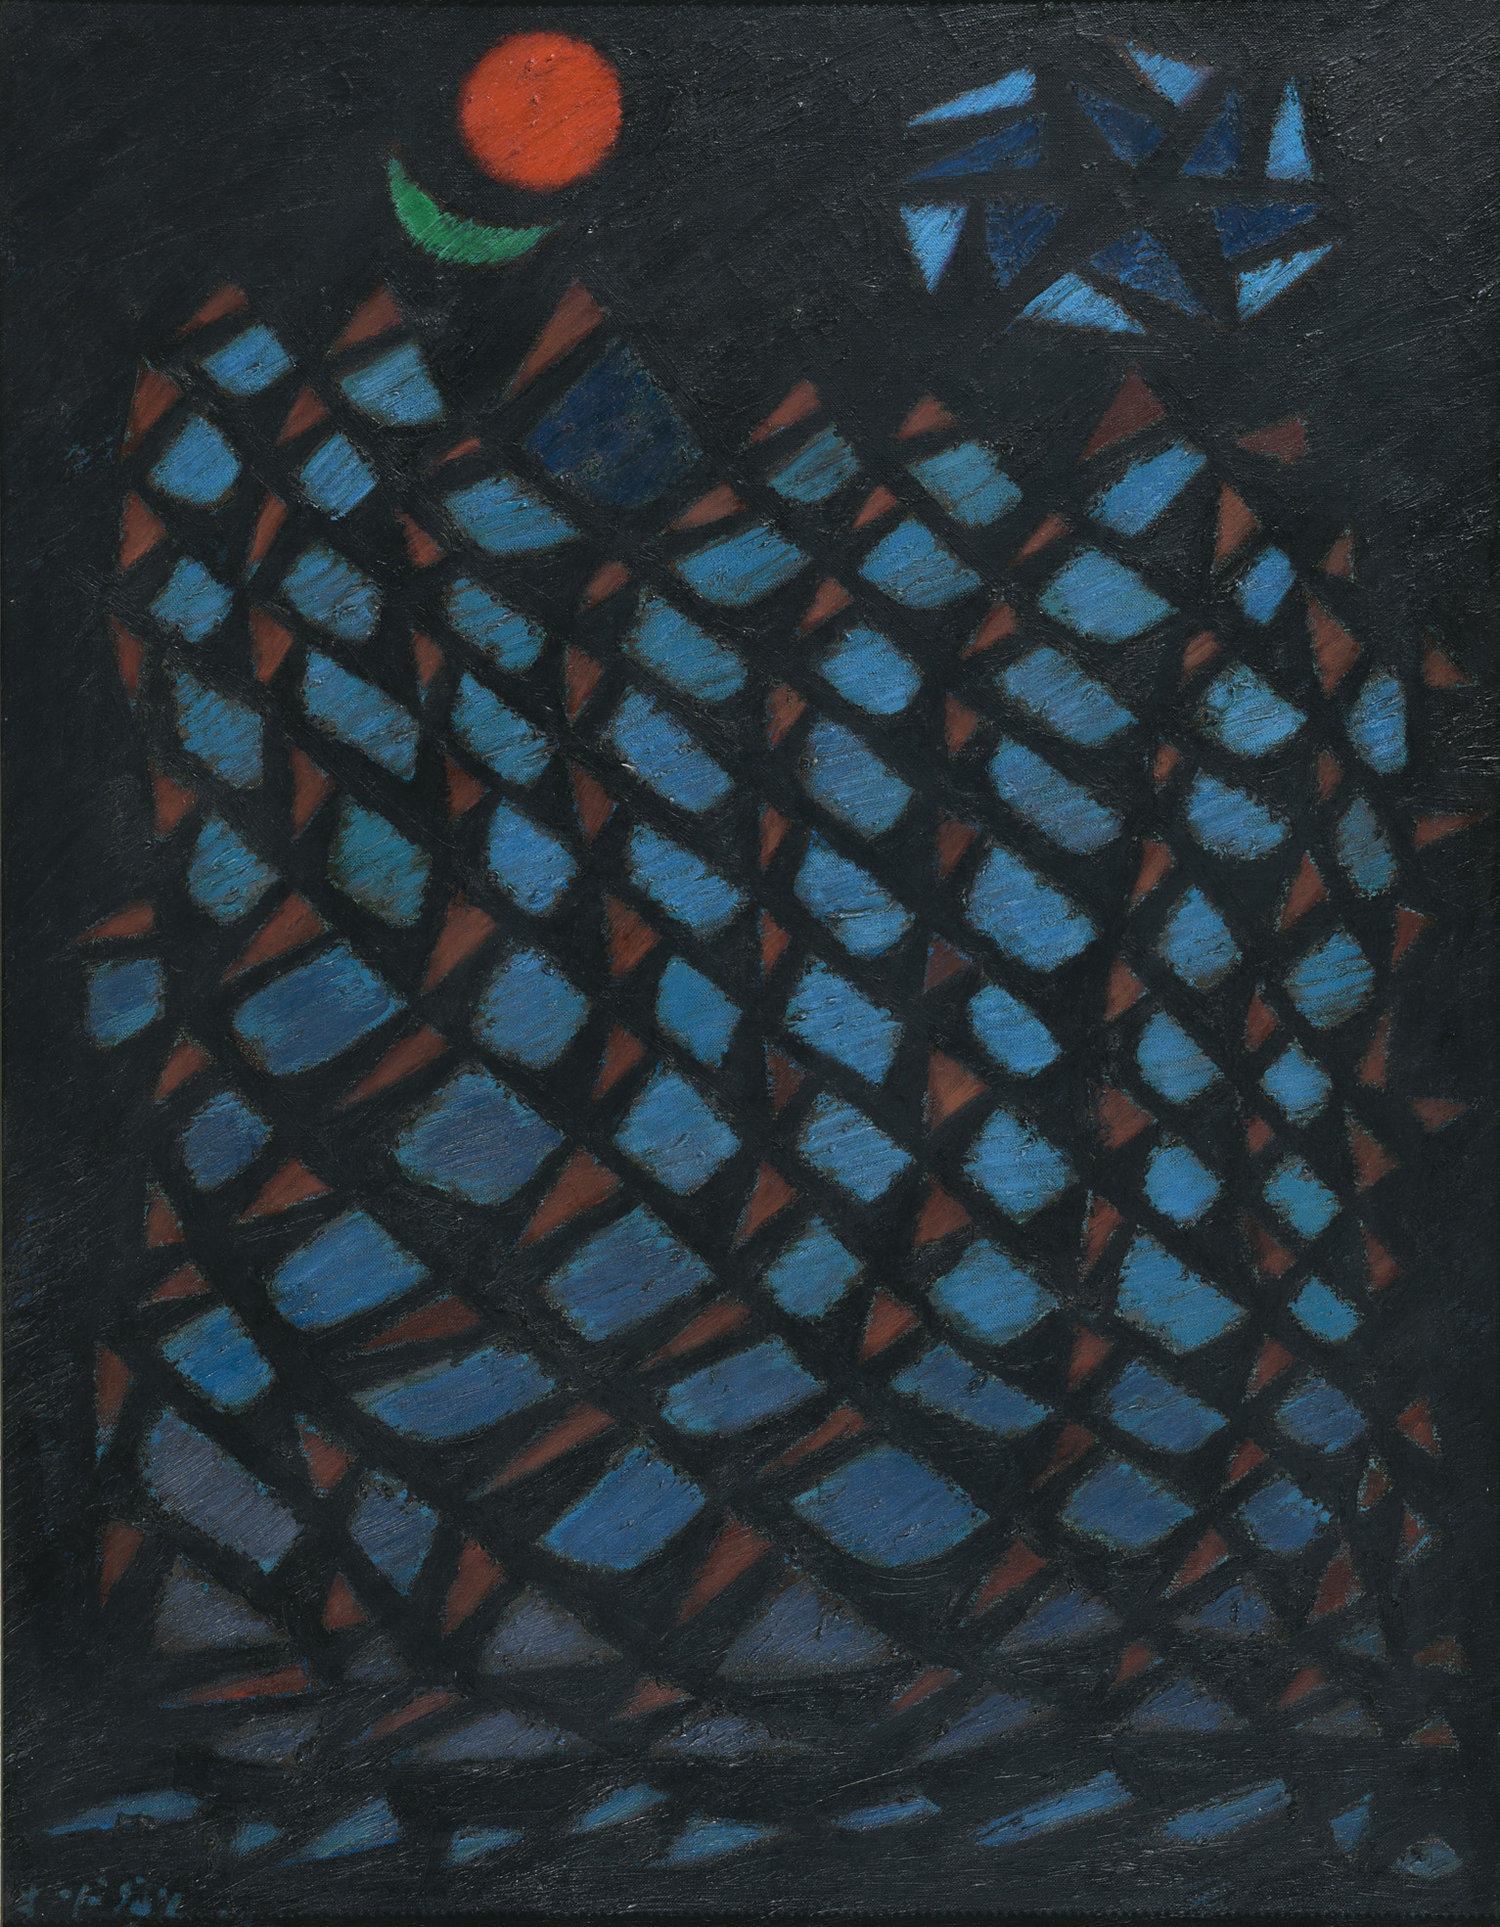 Fadjar Sidik, Untitled, oil on canvas, 88 x 68 cm, 1996